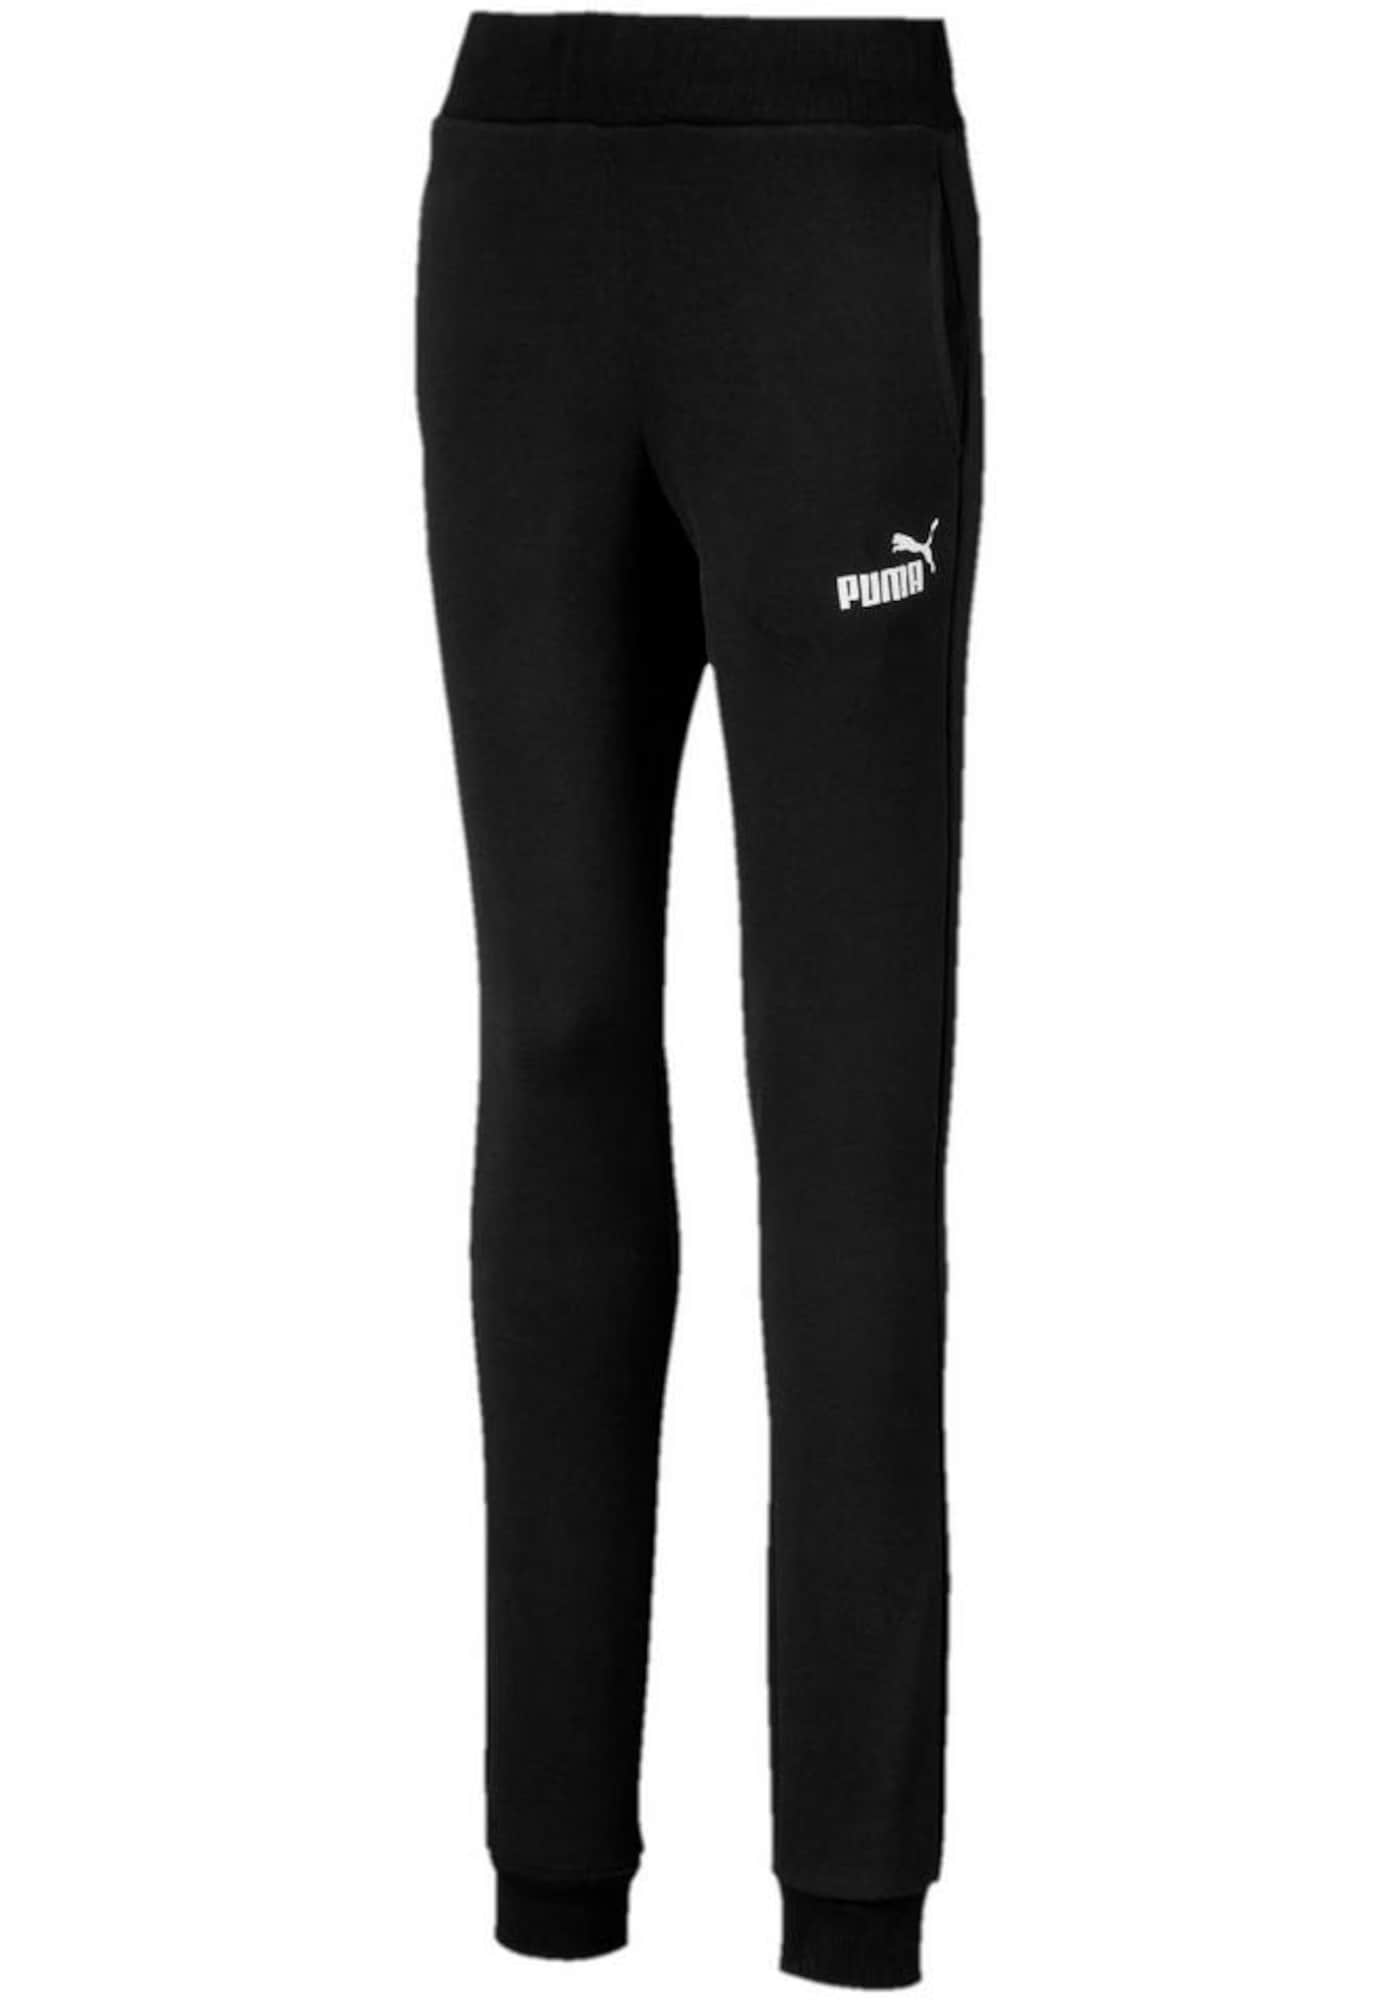 PUMA Sportinės kelnės 'Essentials' juoda / balta